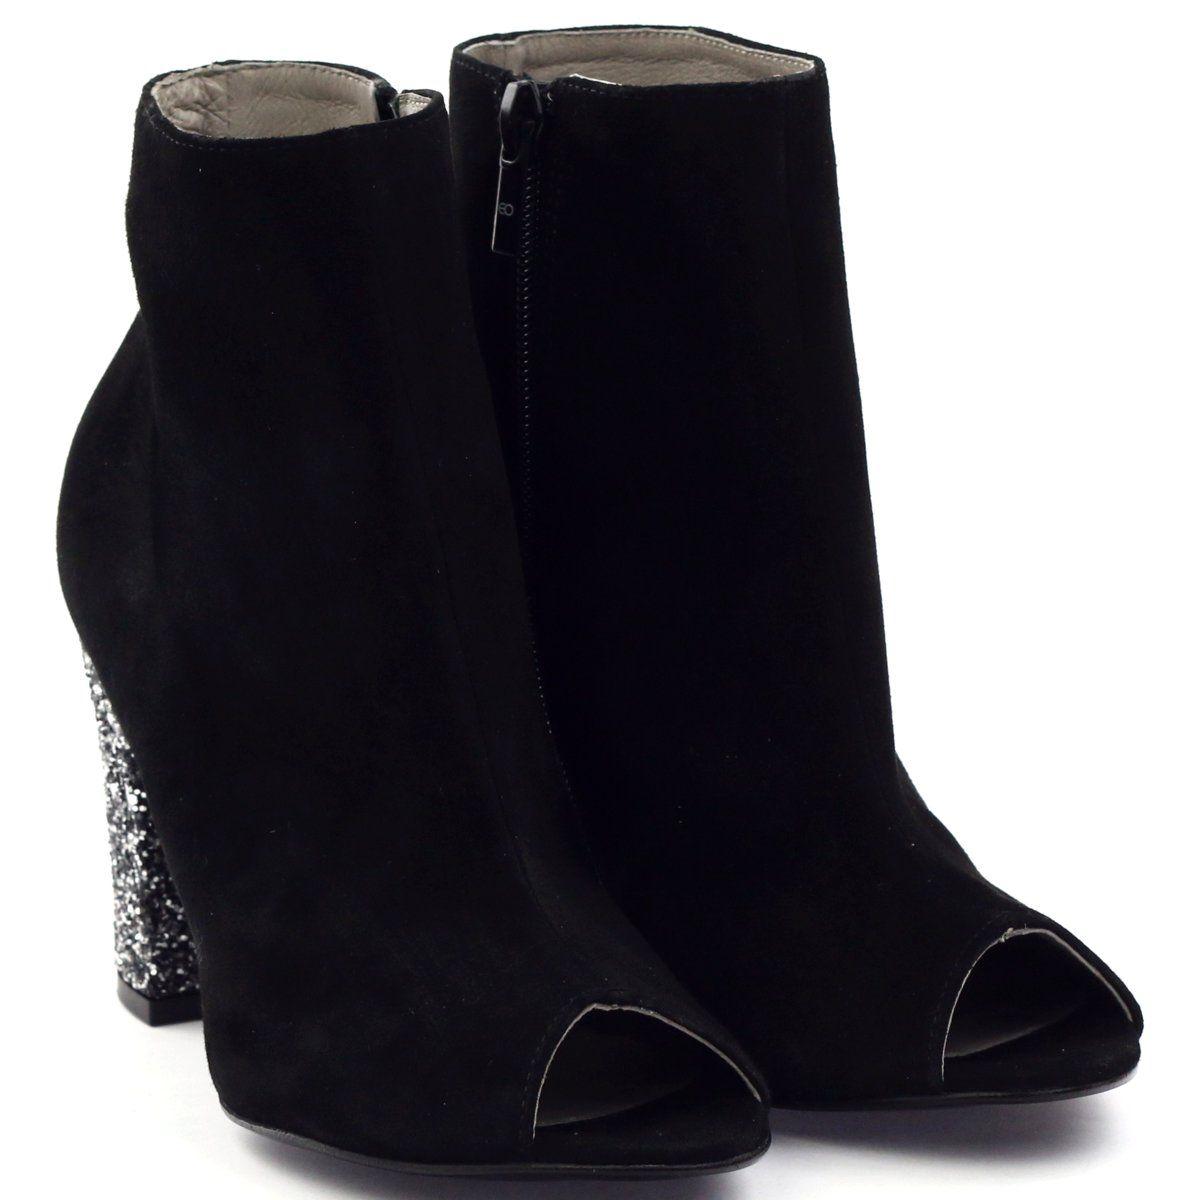 86341ddce22d0 Edeo Botki obcas słupek brokat 2360 czarne   Botki damskie   Boots ...